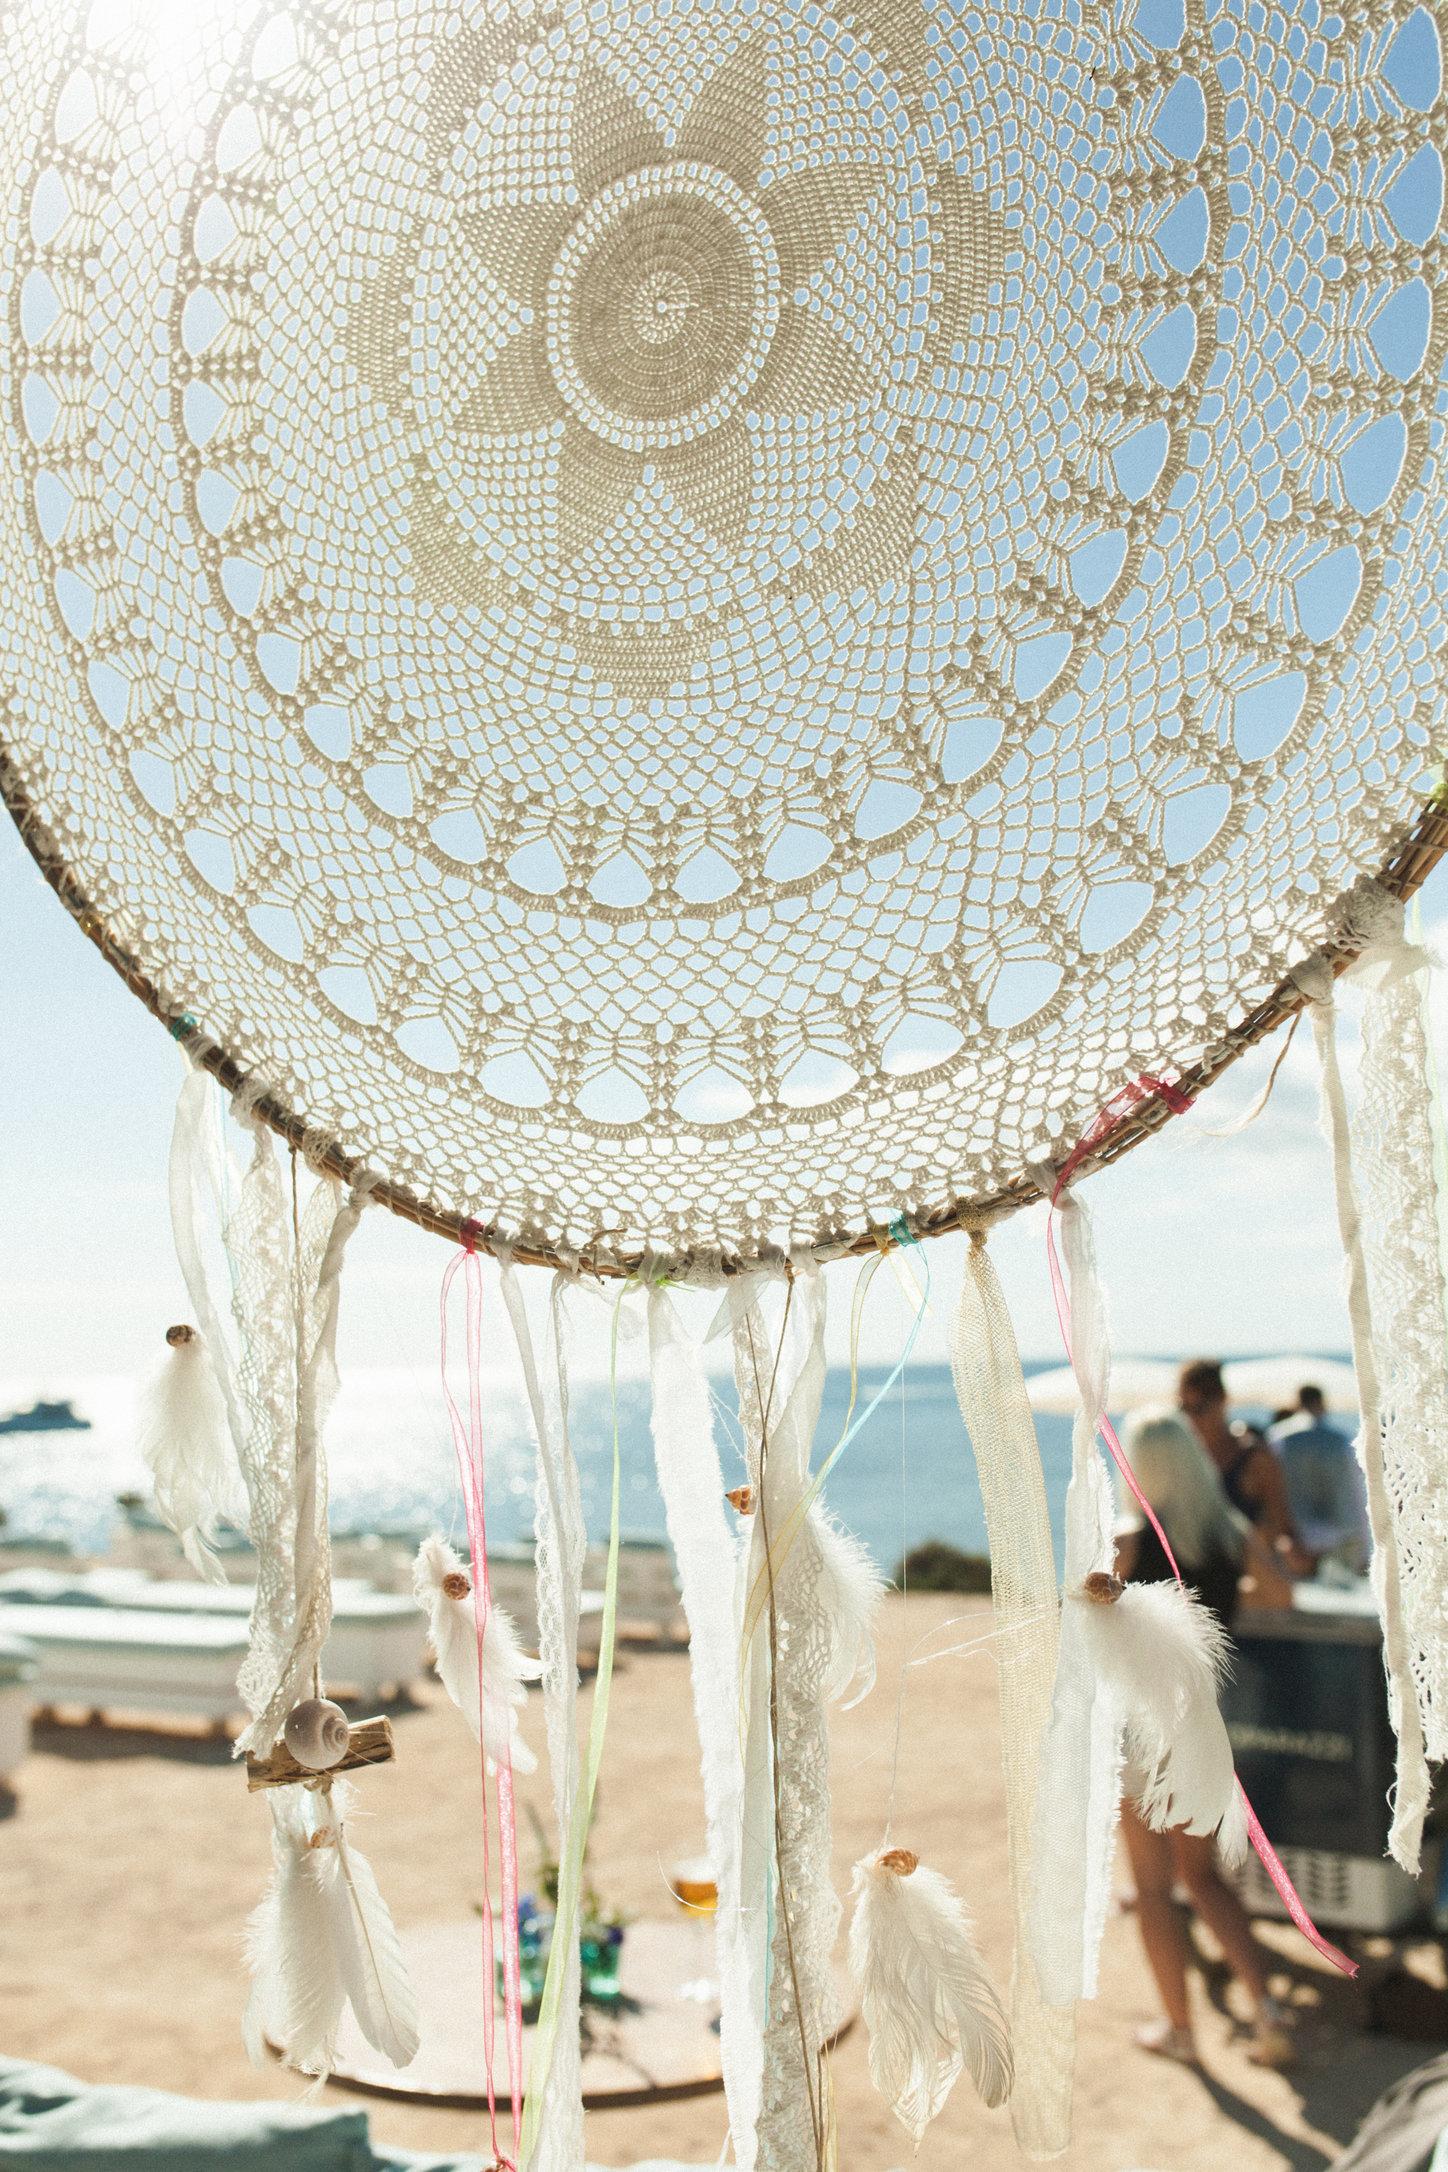 Experimental_Beach_Ibiza-3.jpg